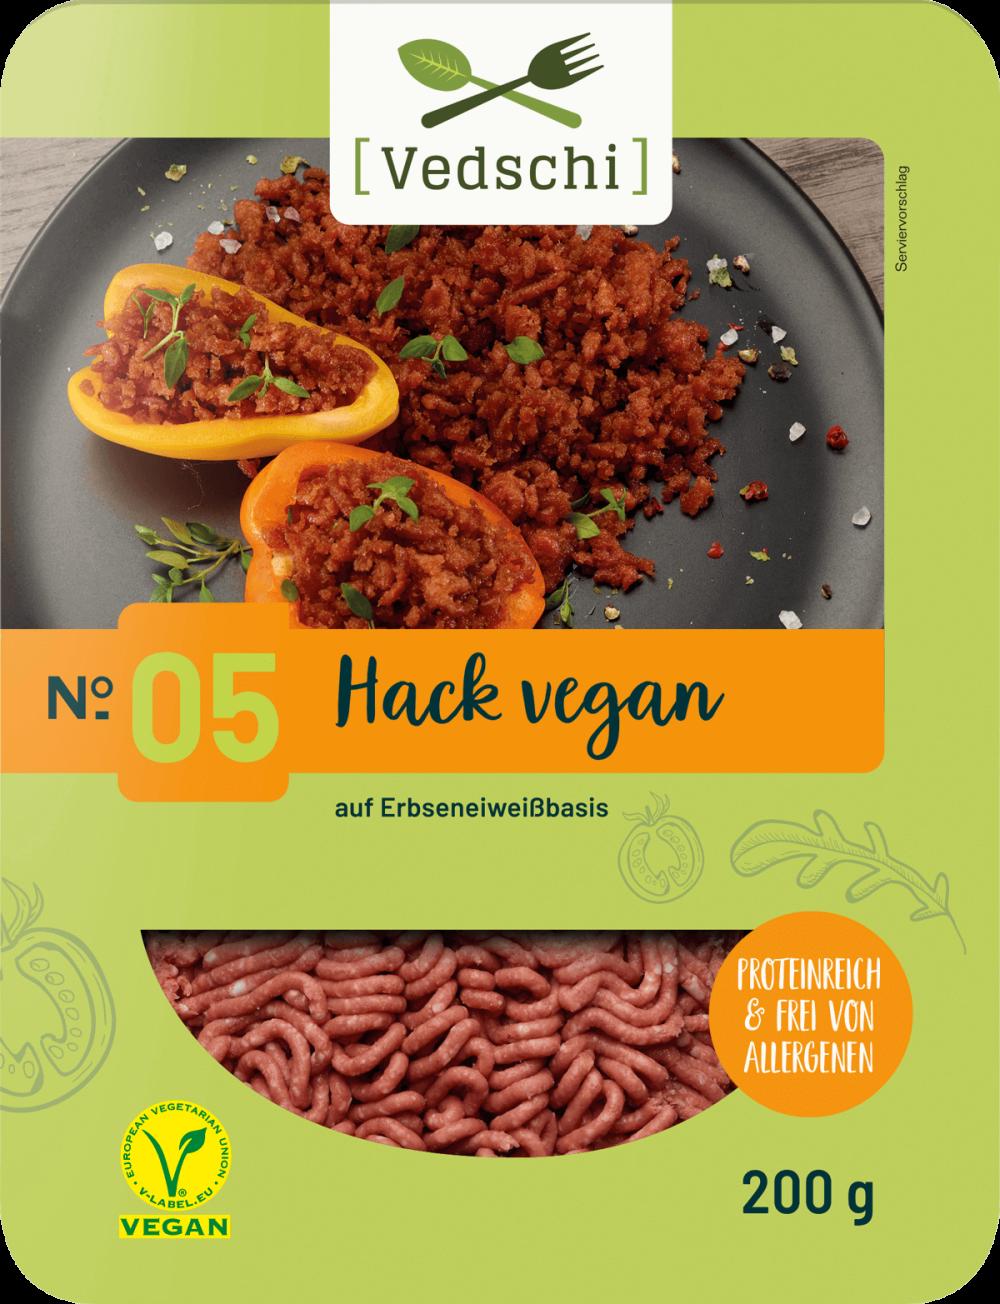 Vedschi № 05 Hack vegan im Verpackungsdesign